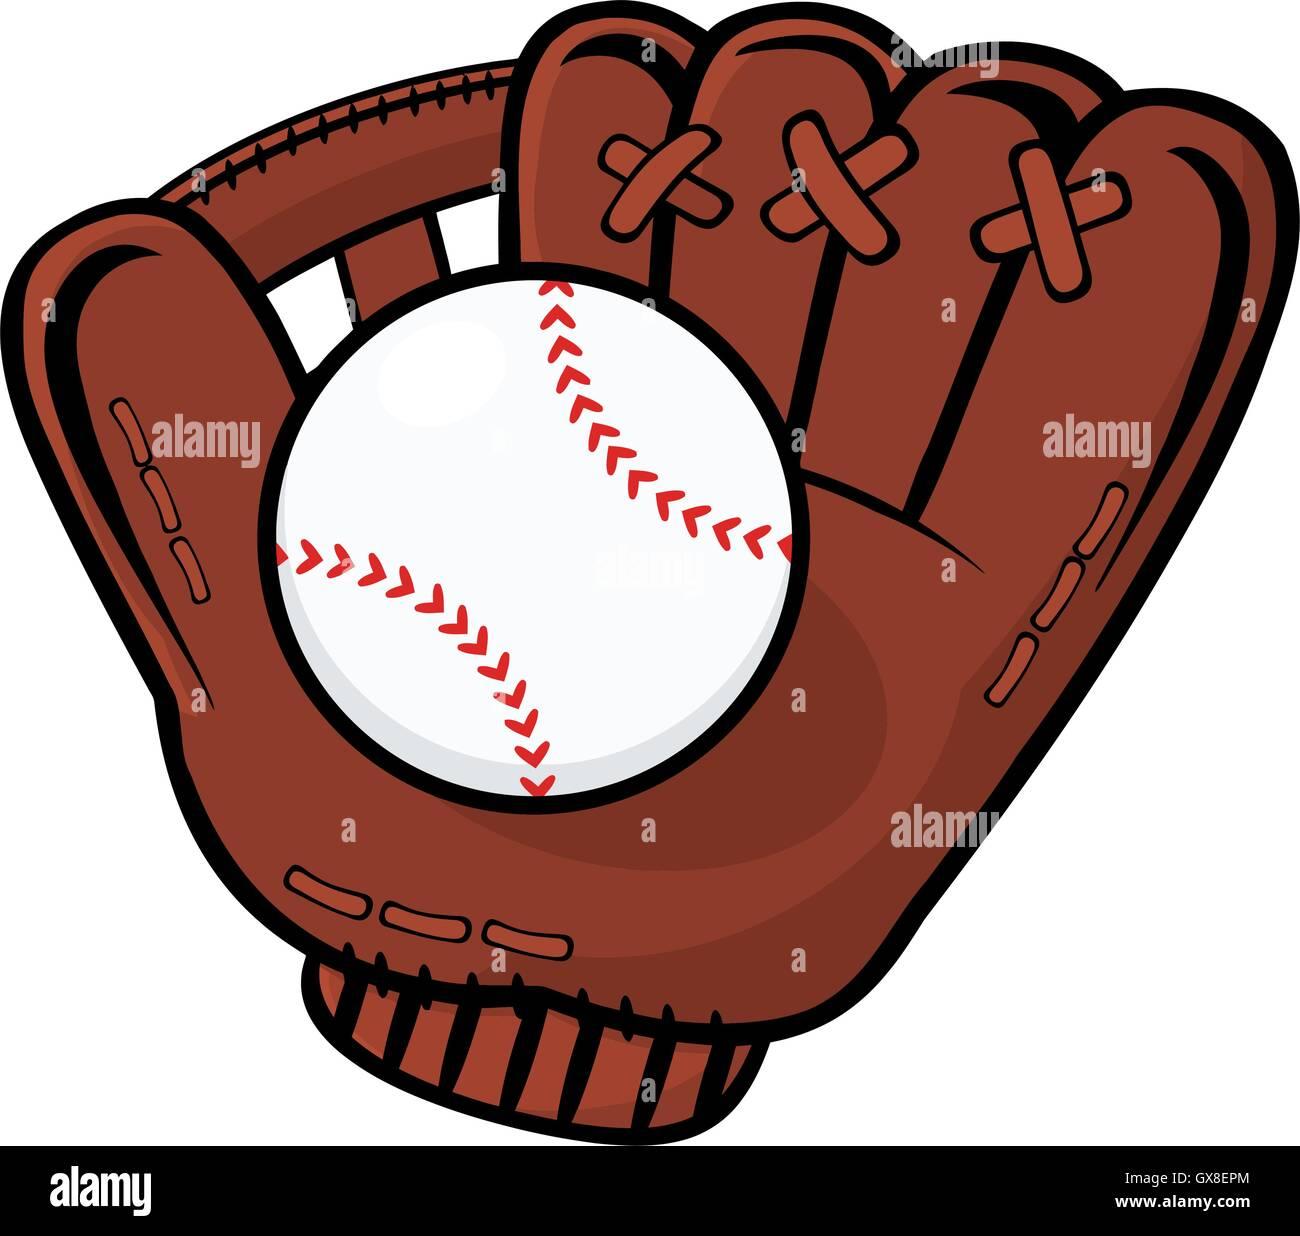 baseball glove and ball illustration isolated on white background rh alamy com baseball mitt clipart black and white Baseball Diamond Clip Art